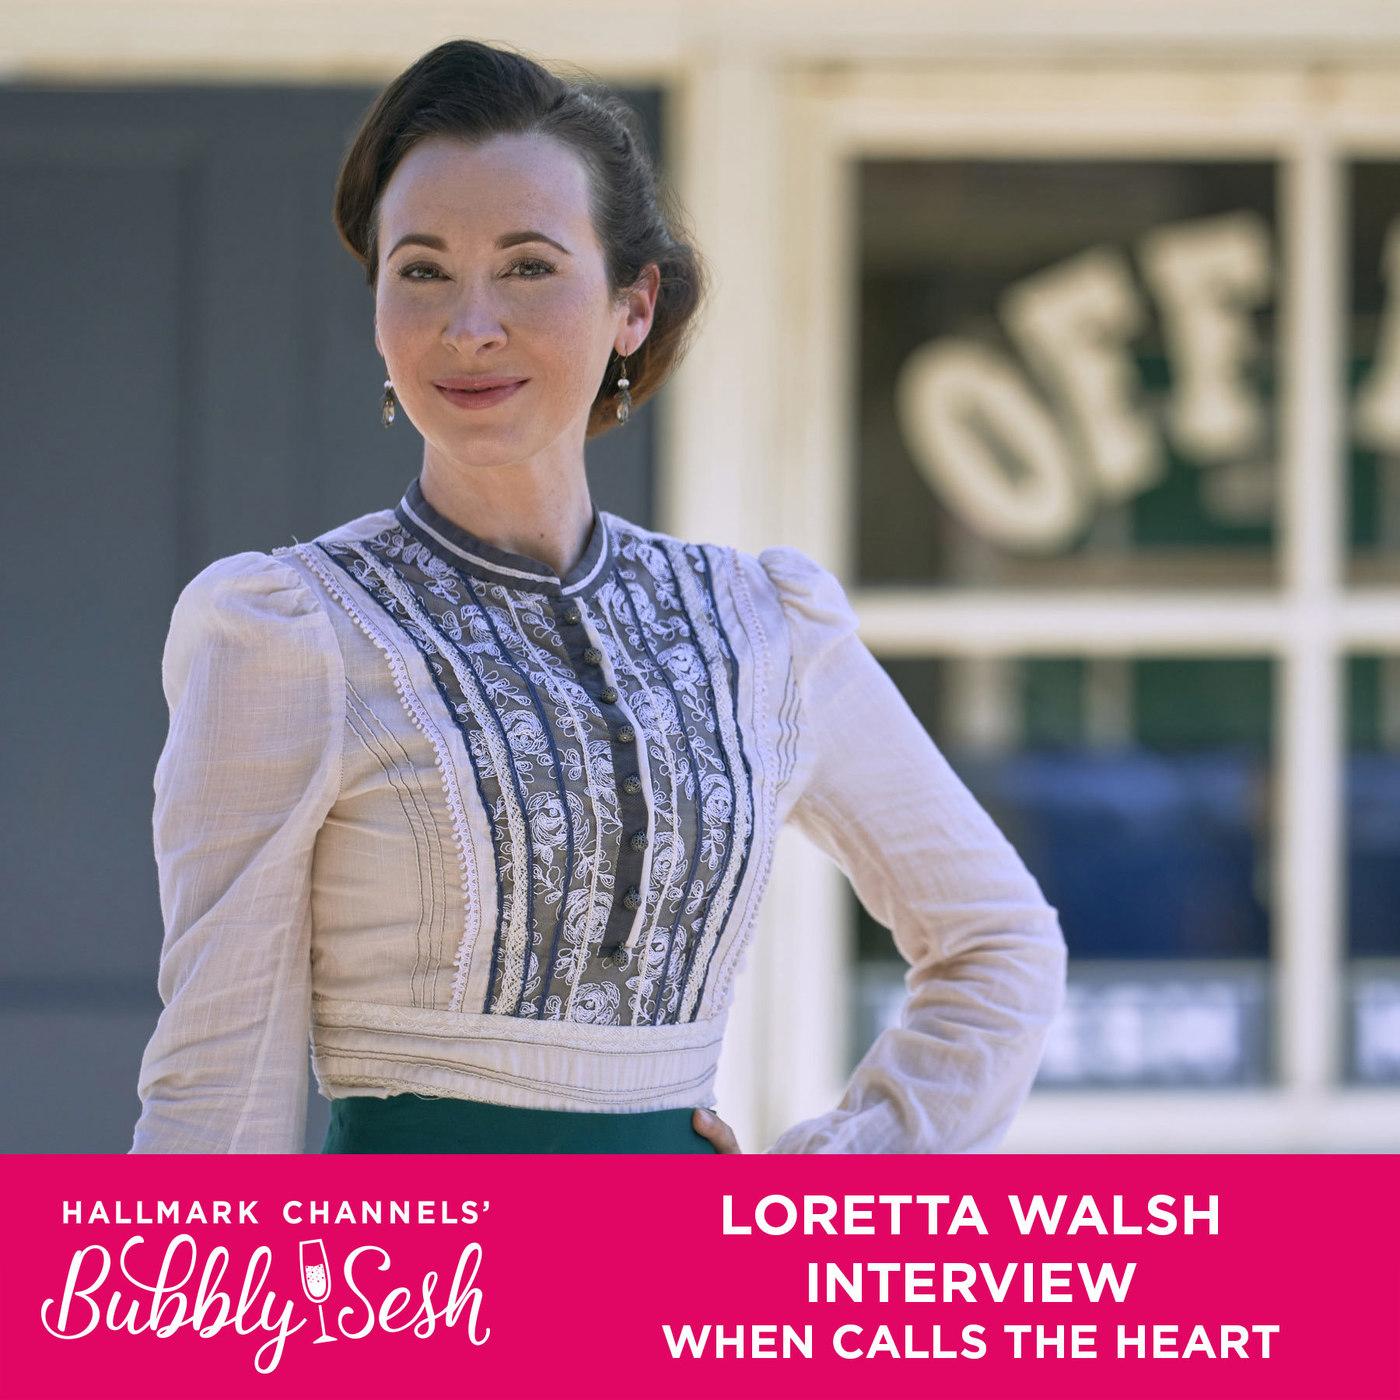 Loretta Walsh Interview